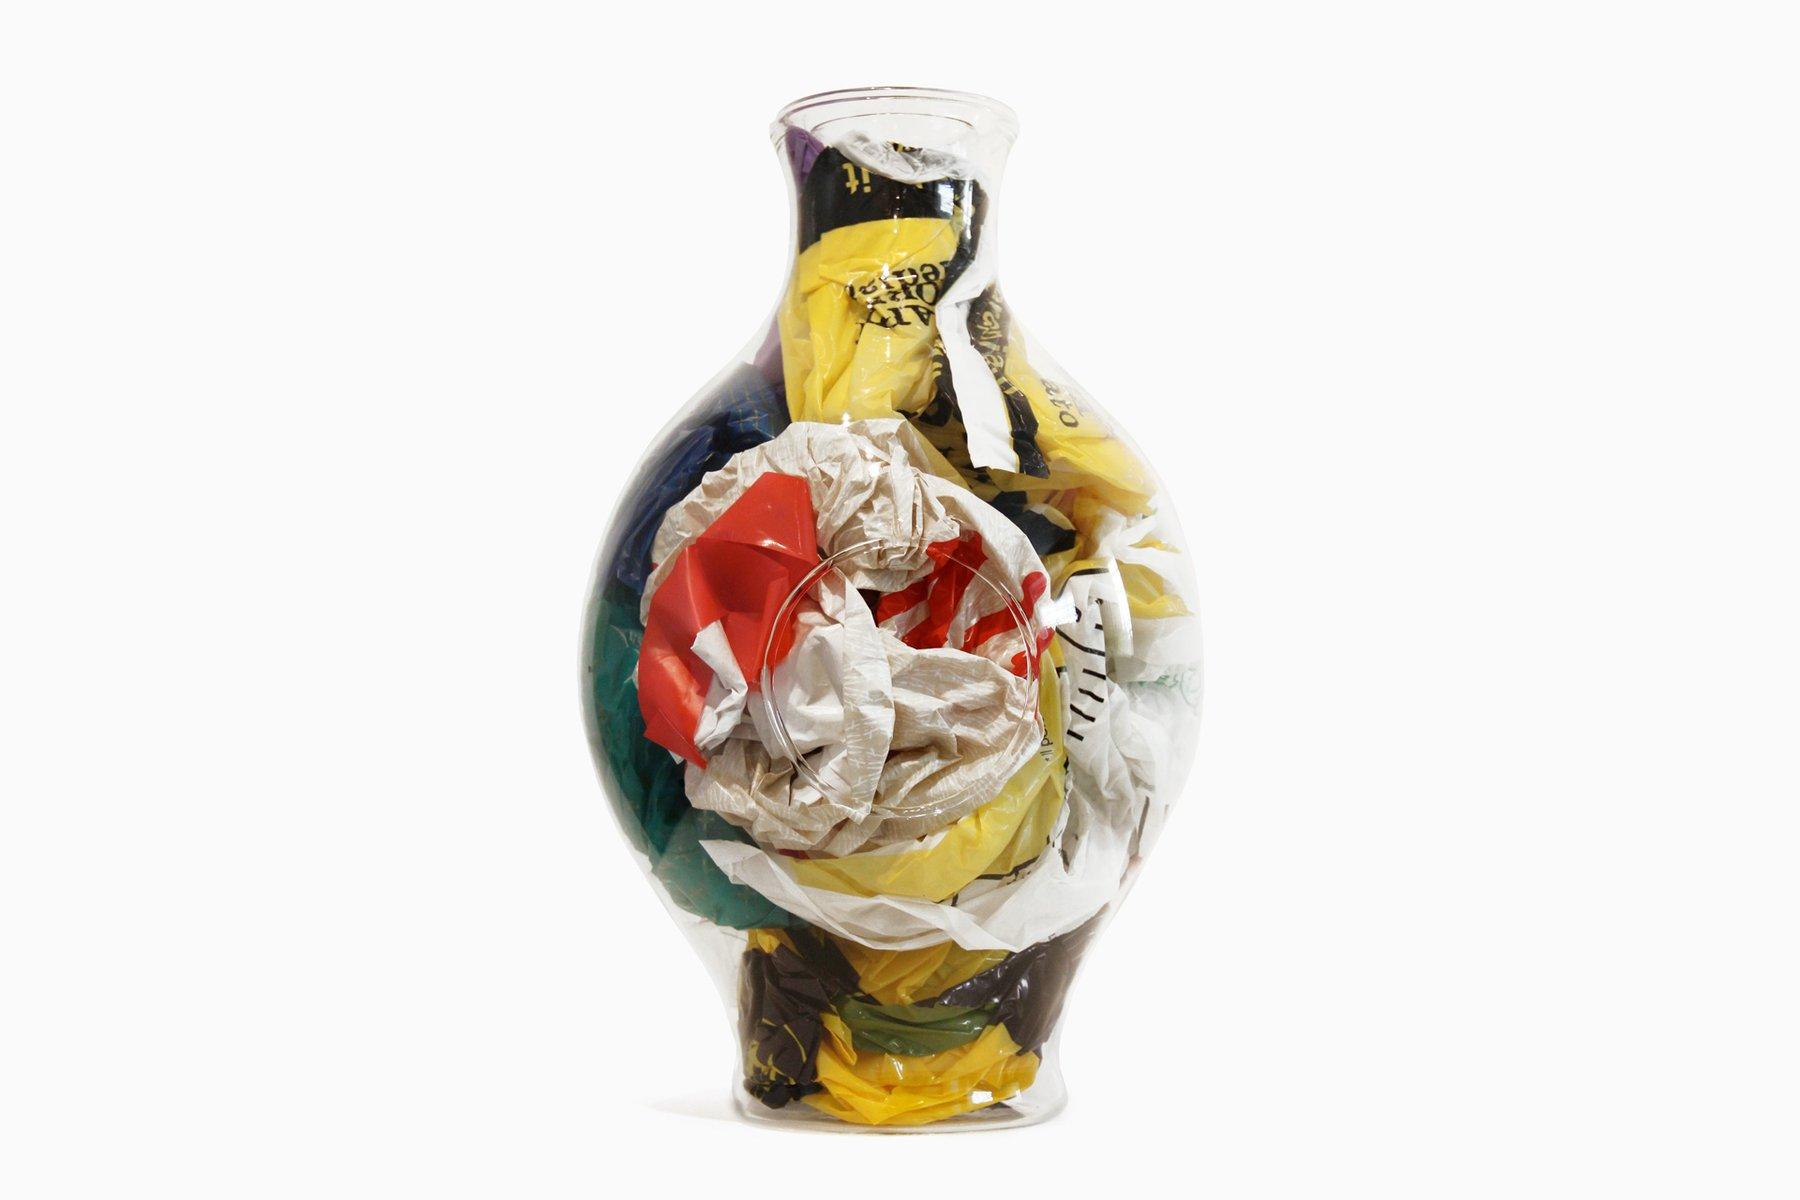 Crateri #1 Vase by Andrea Anastasio